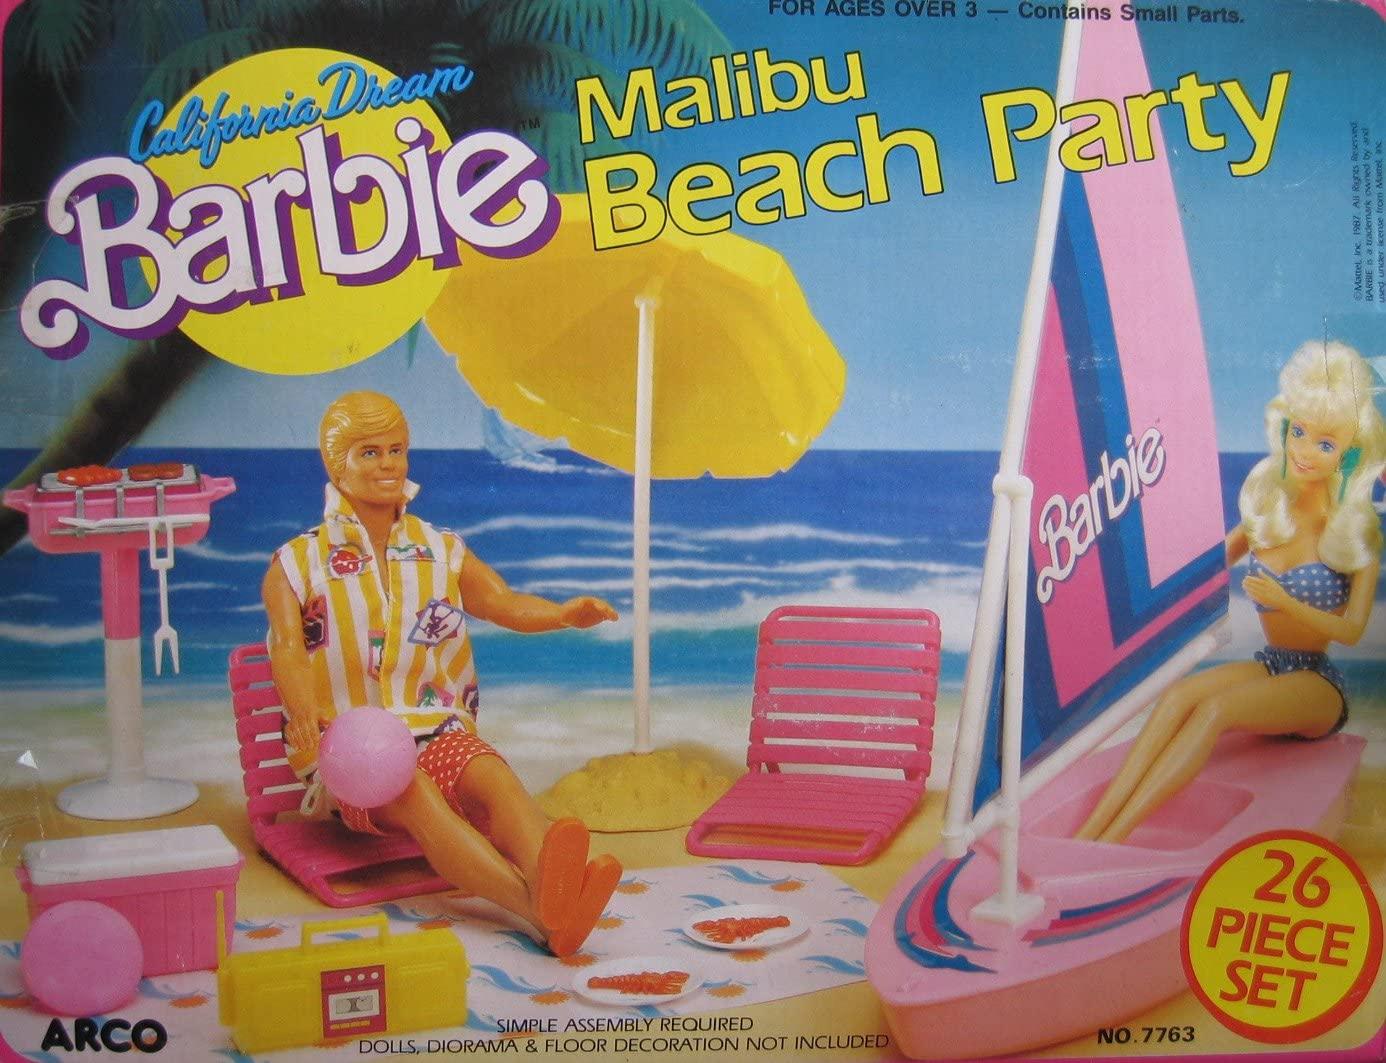 California Dream Malibu Beach Party 26 Piece Playset (1987)